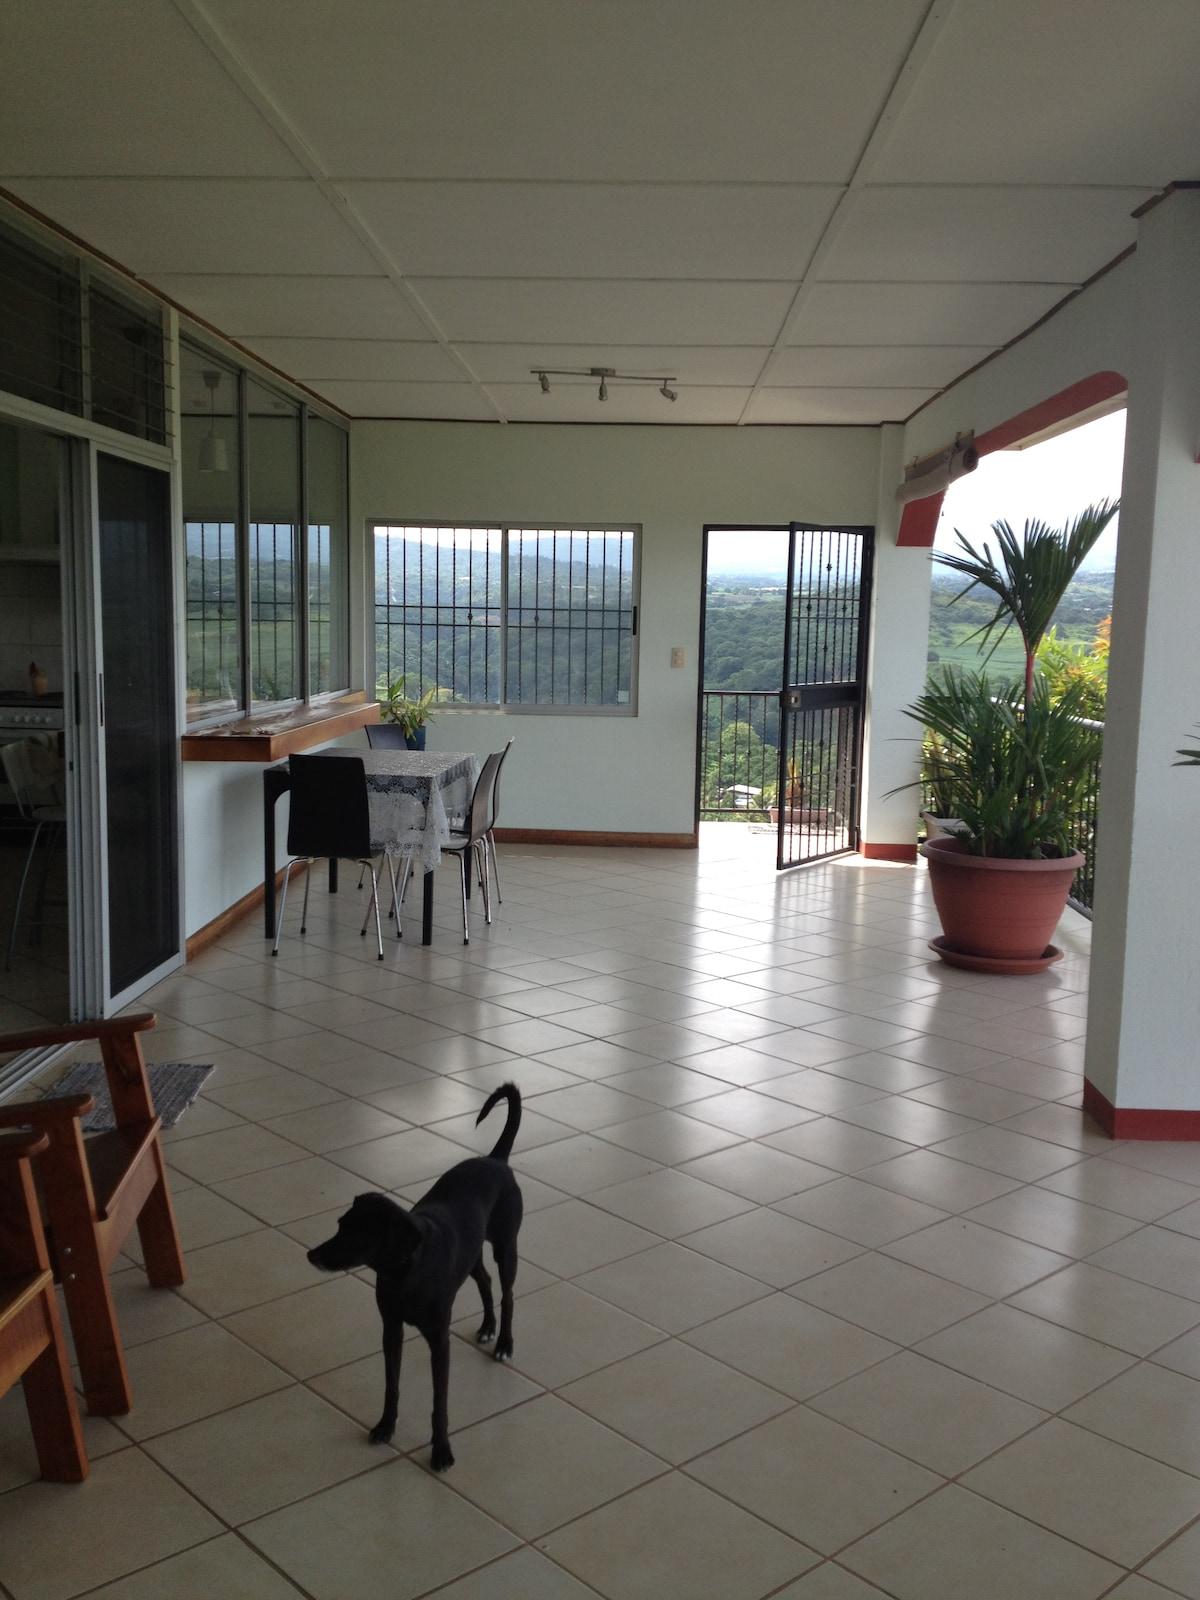 2bed 2bat apartment for rent Atenas